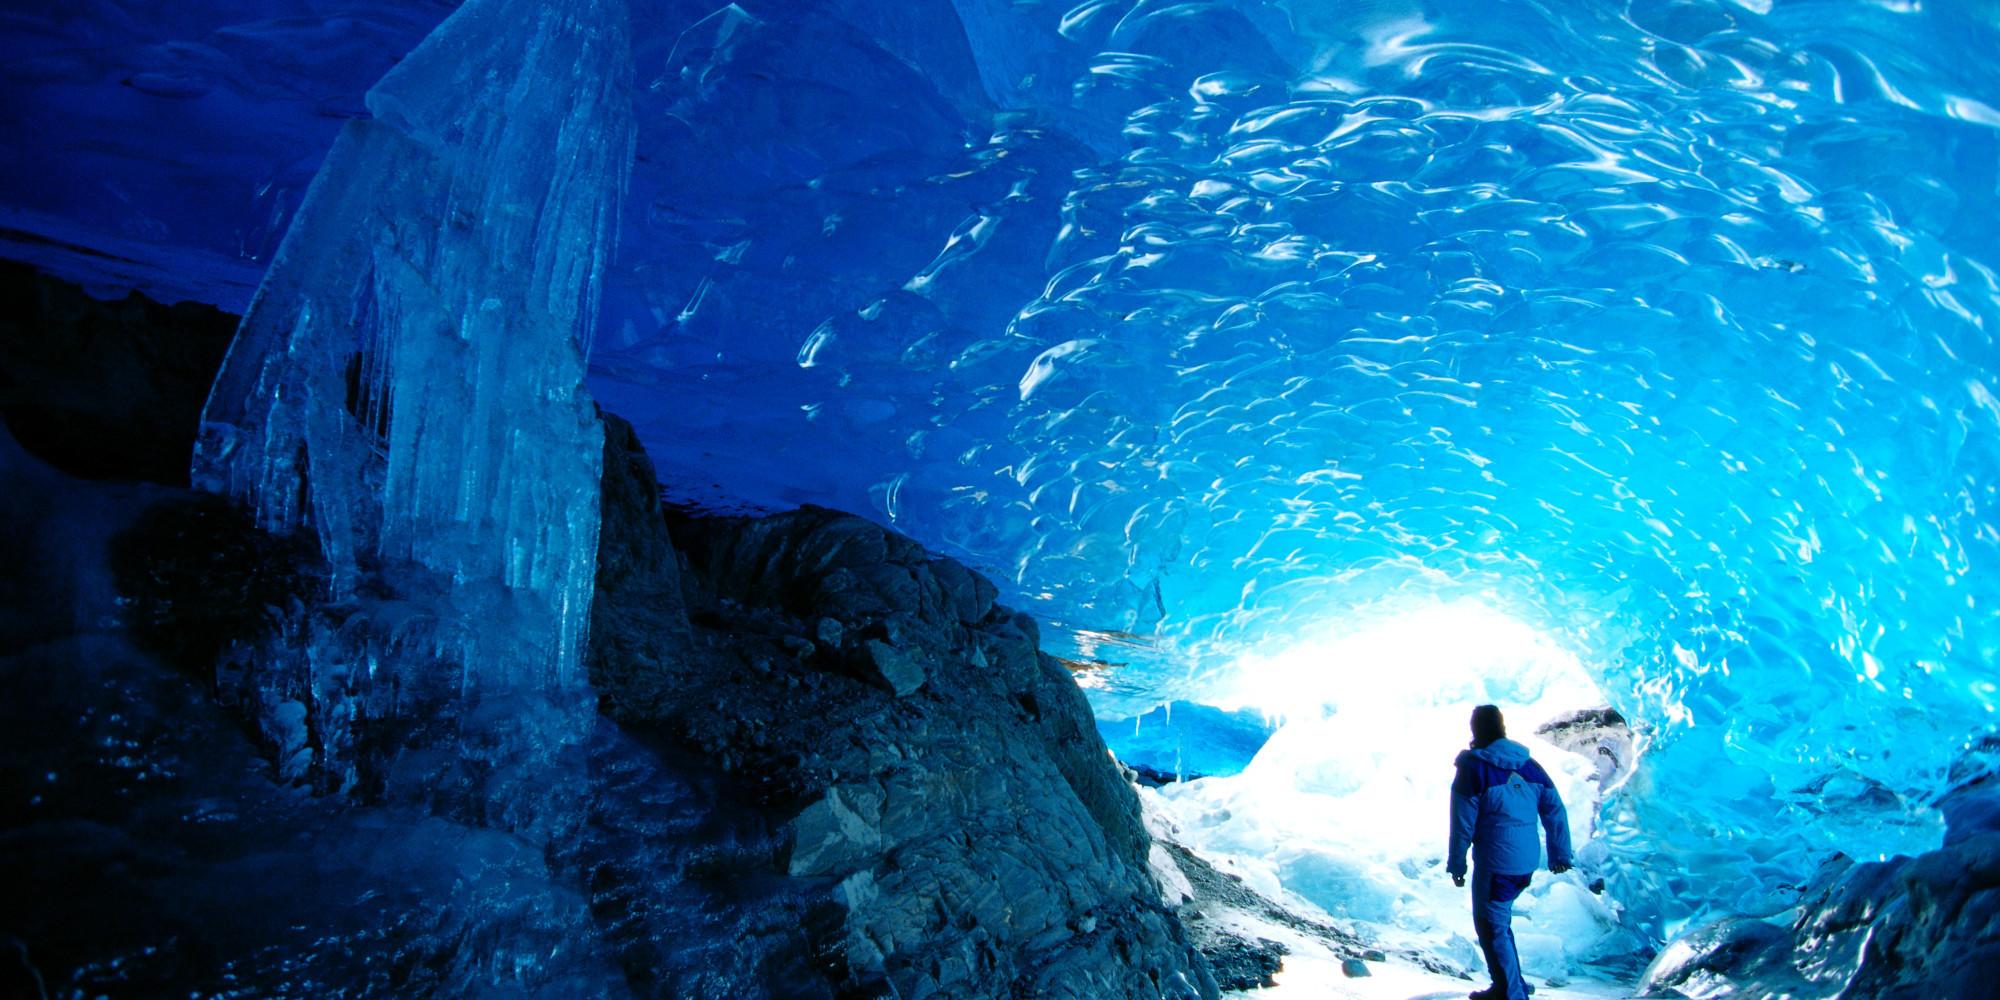 Mendenhall Glacier Wallpapers HD